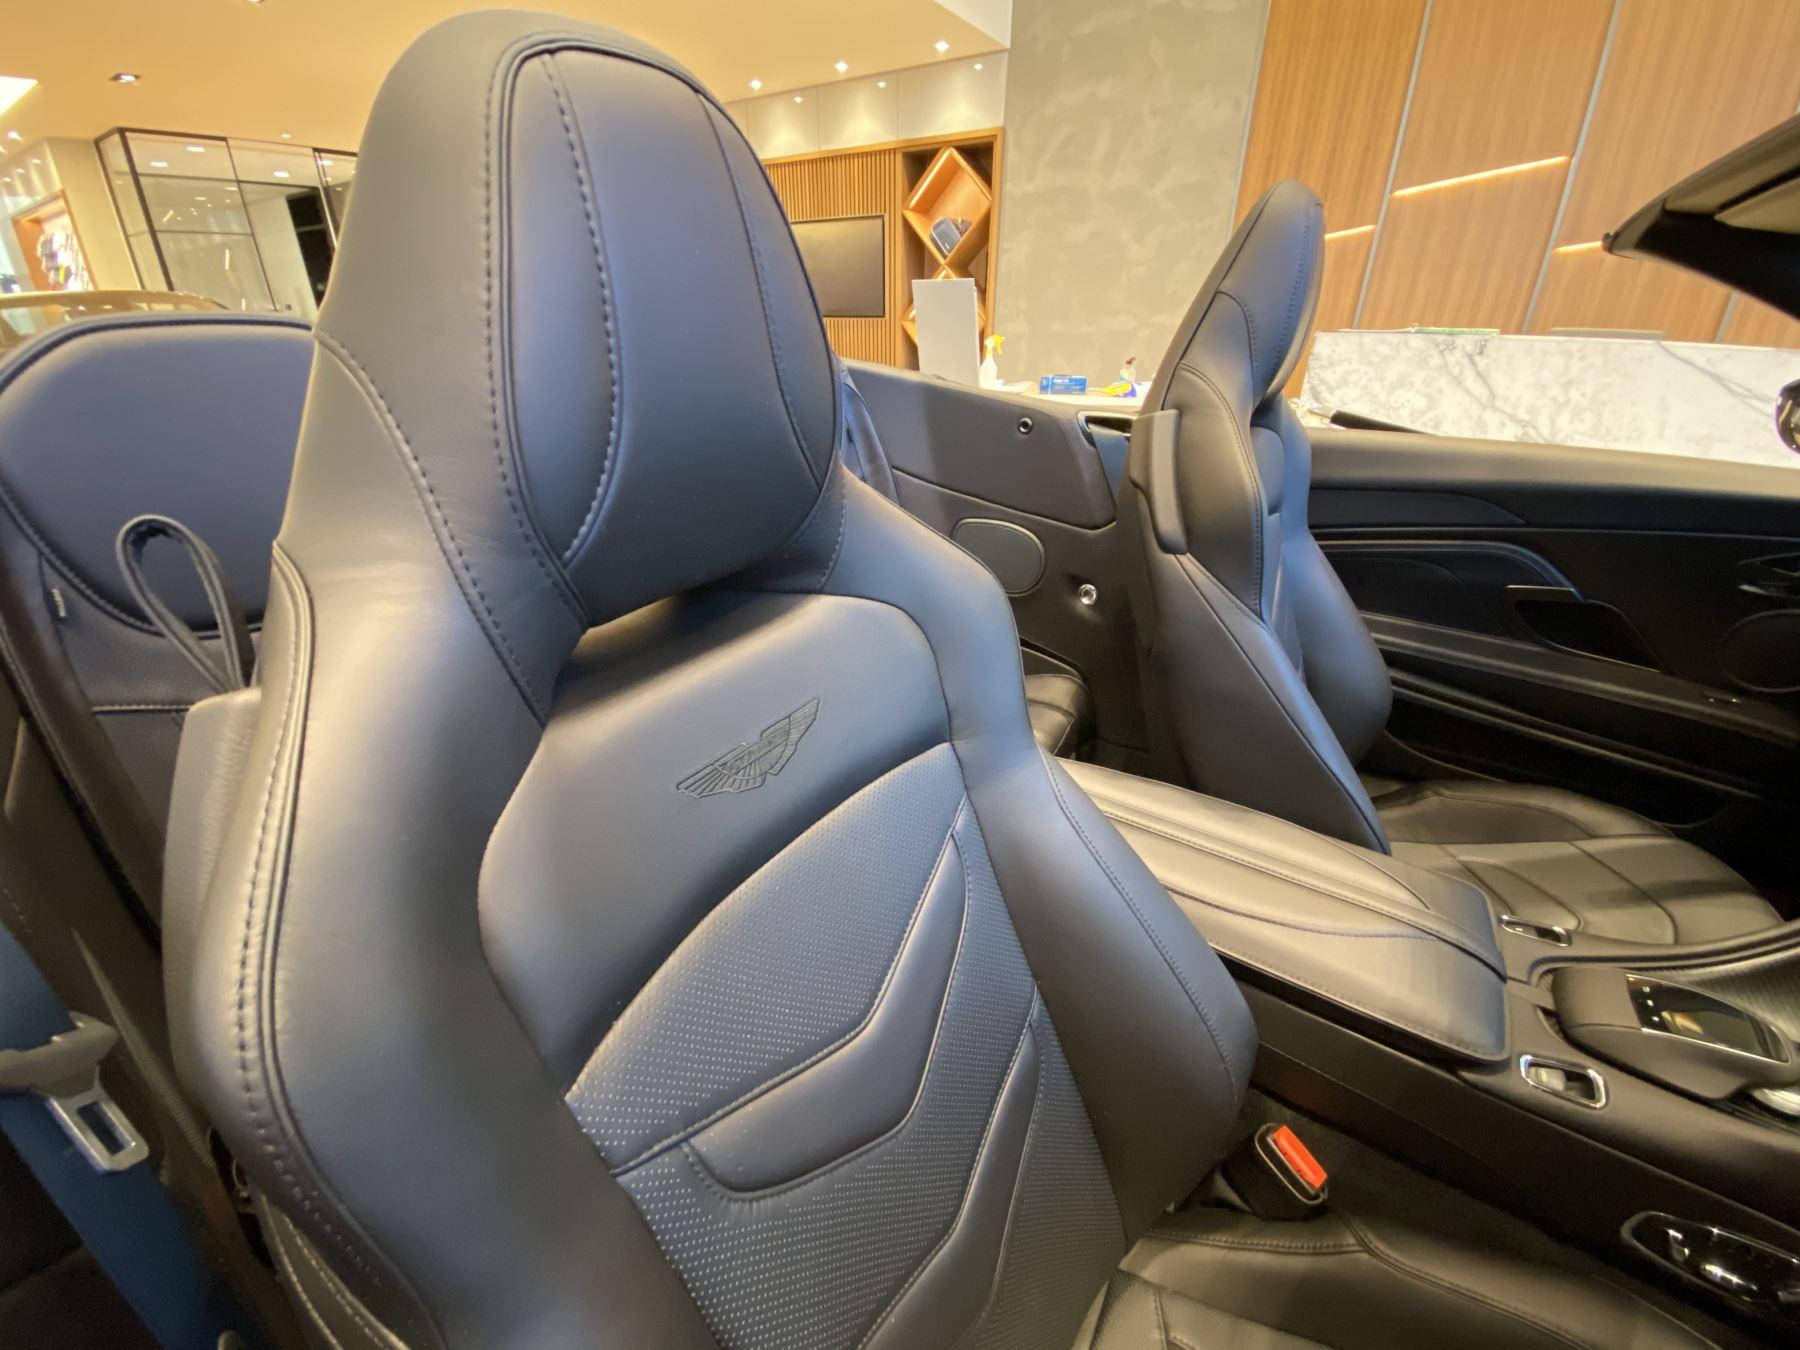 Aston Martin DBS V12 Superleggera Volante Touchtronic image 18